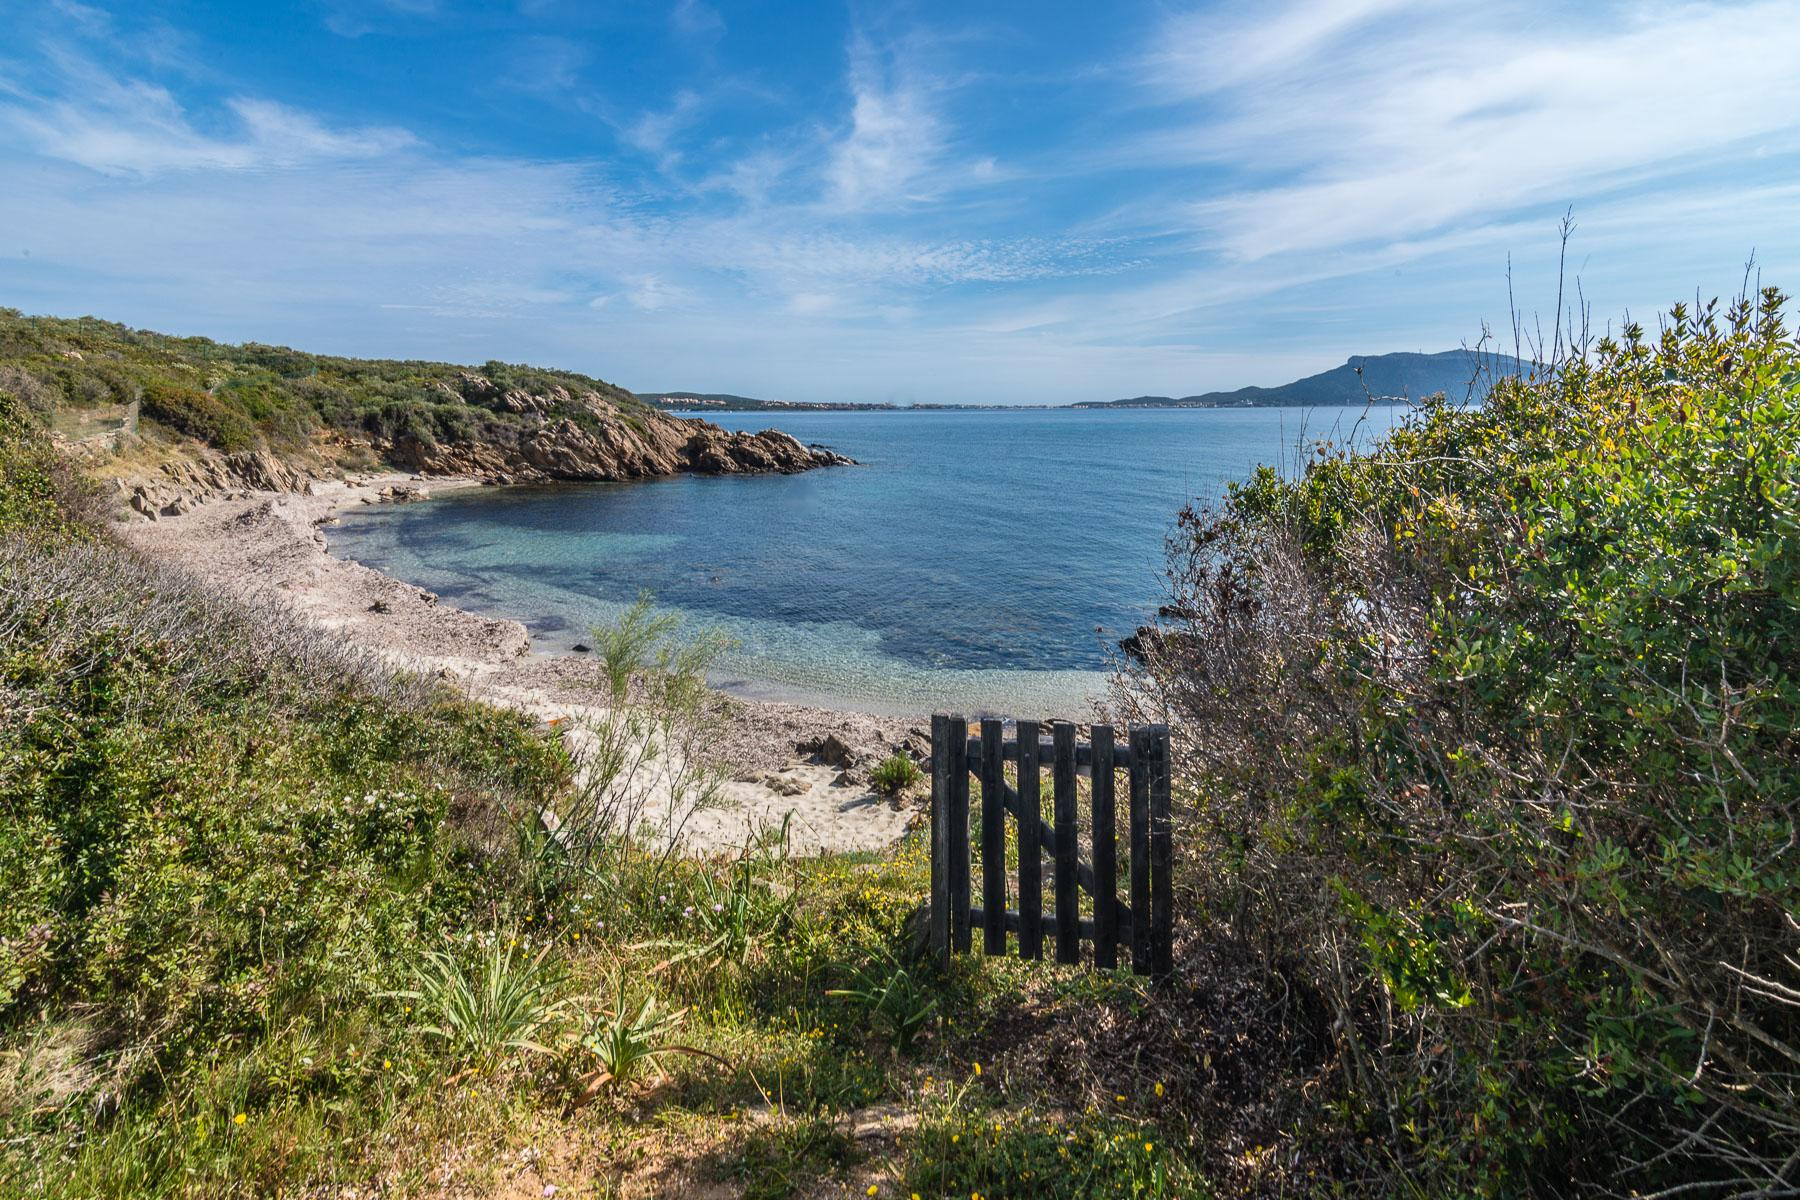 Golfo Aranci Sos Aranzos Wonderfull Villa with direct access to the beach - 21